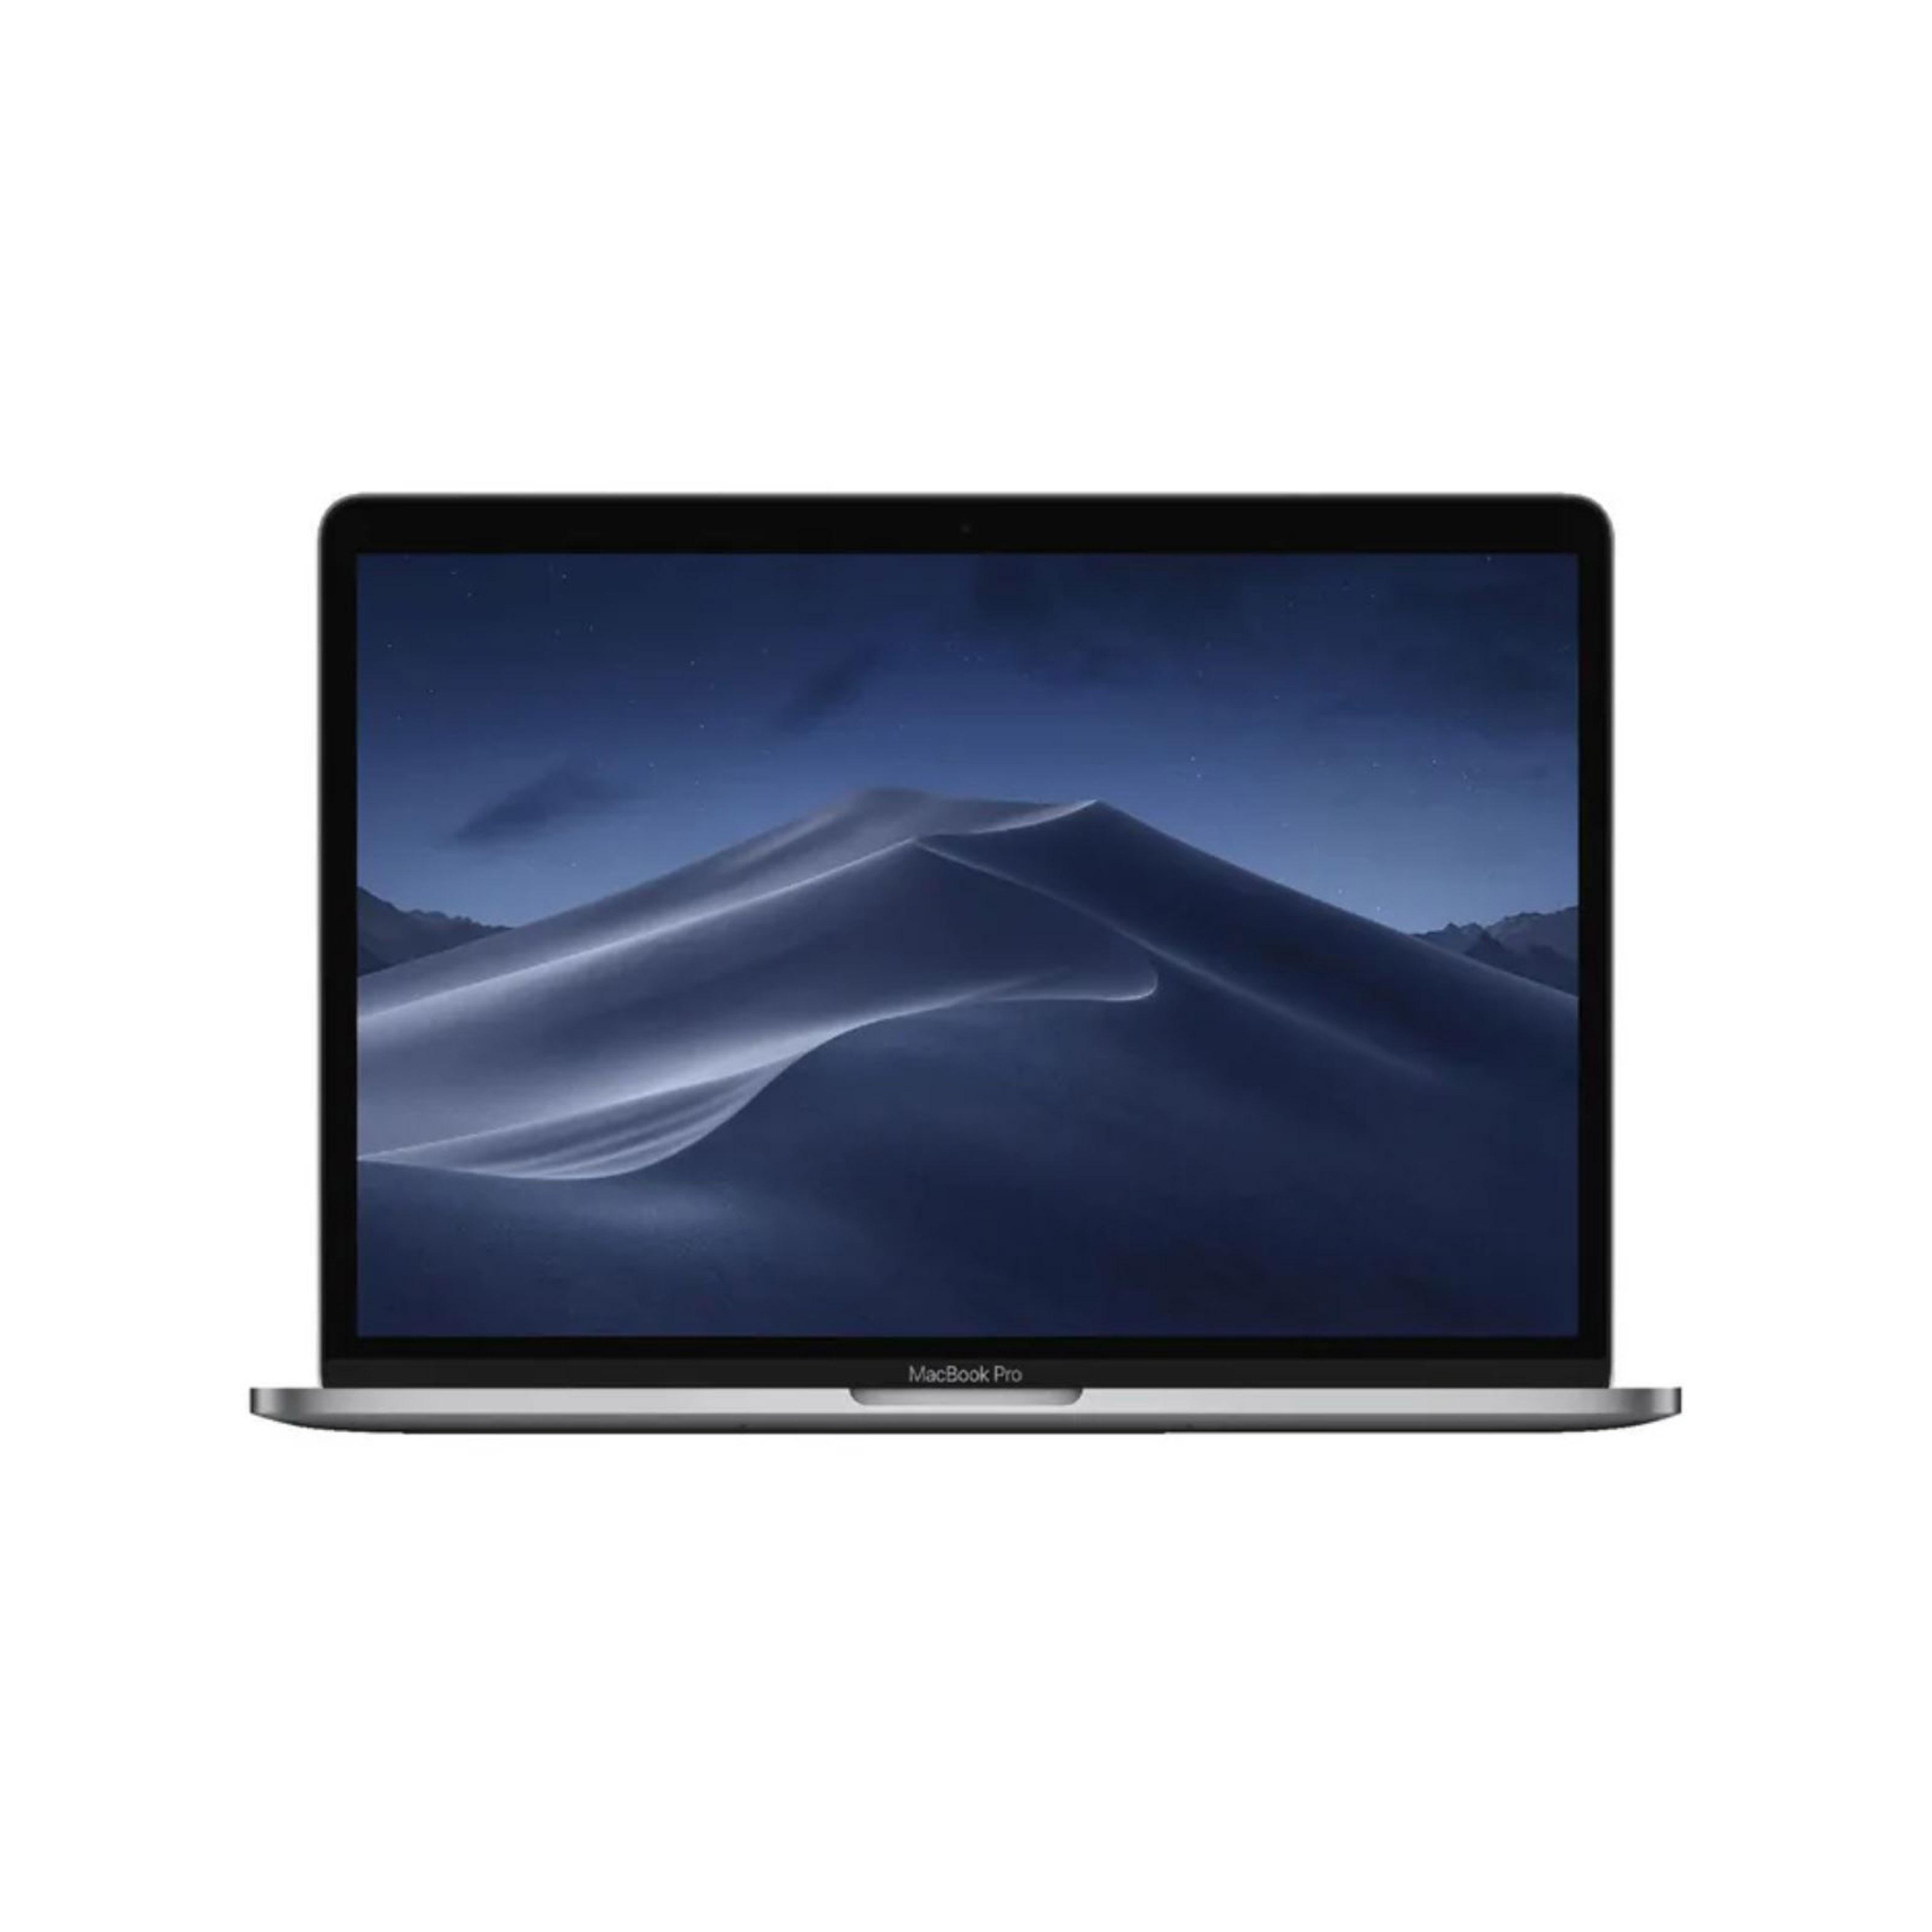 Apple 13in MacBook Pro 2019 - 2.4GHz 8th Gen Intel i5 256GB - Space Grey (MV962X/A)